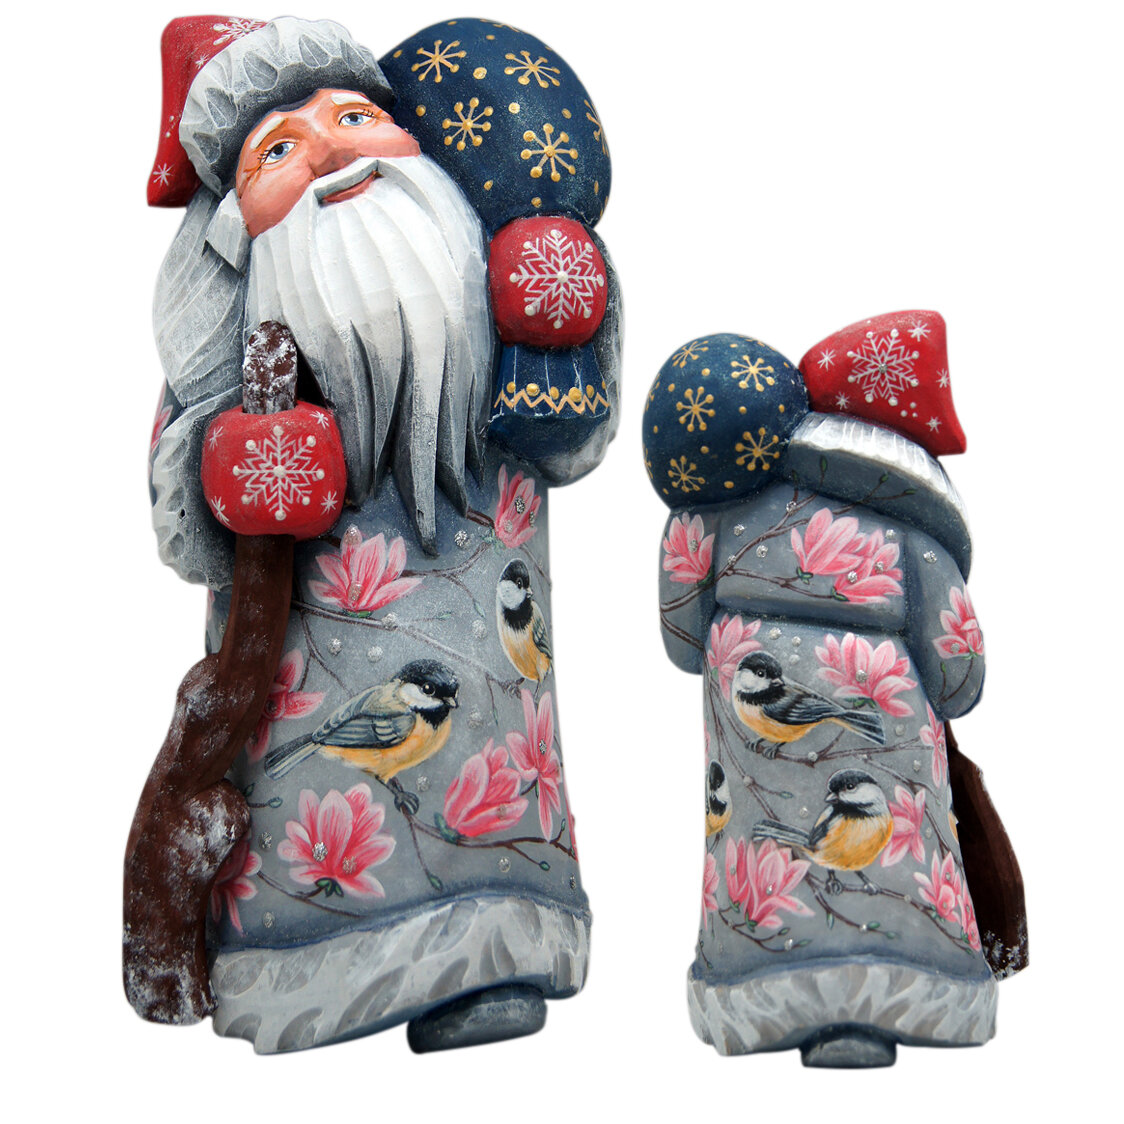 Gray Pink Santa Figurines You Ll Love In 2021 Wayfair